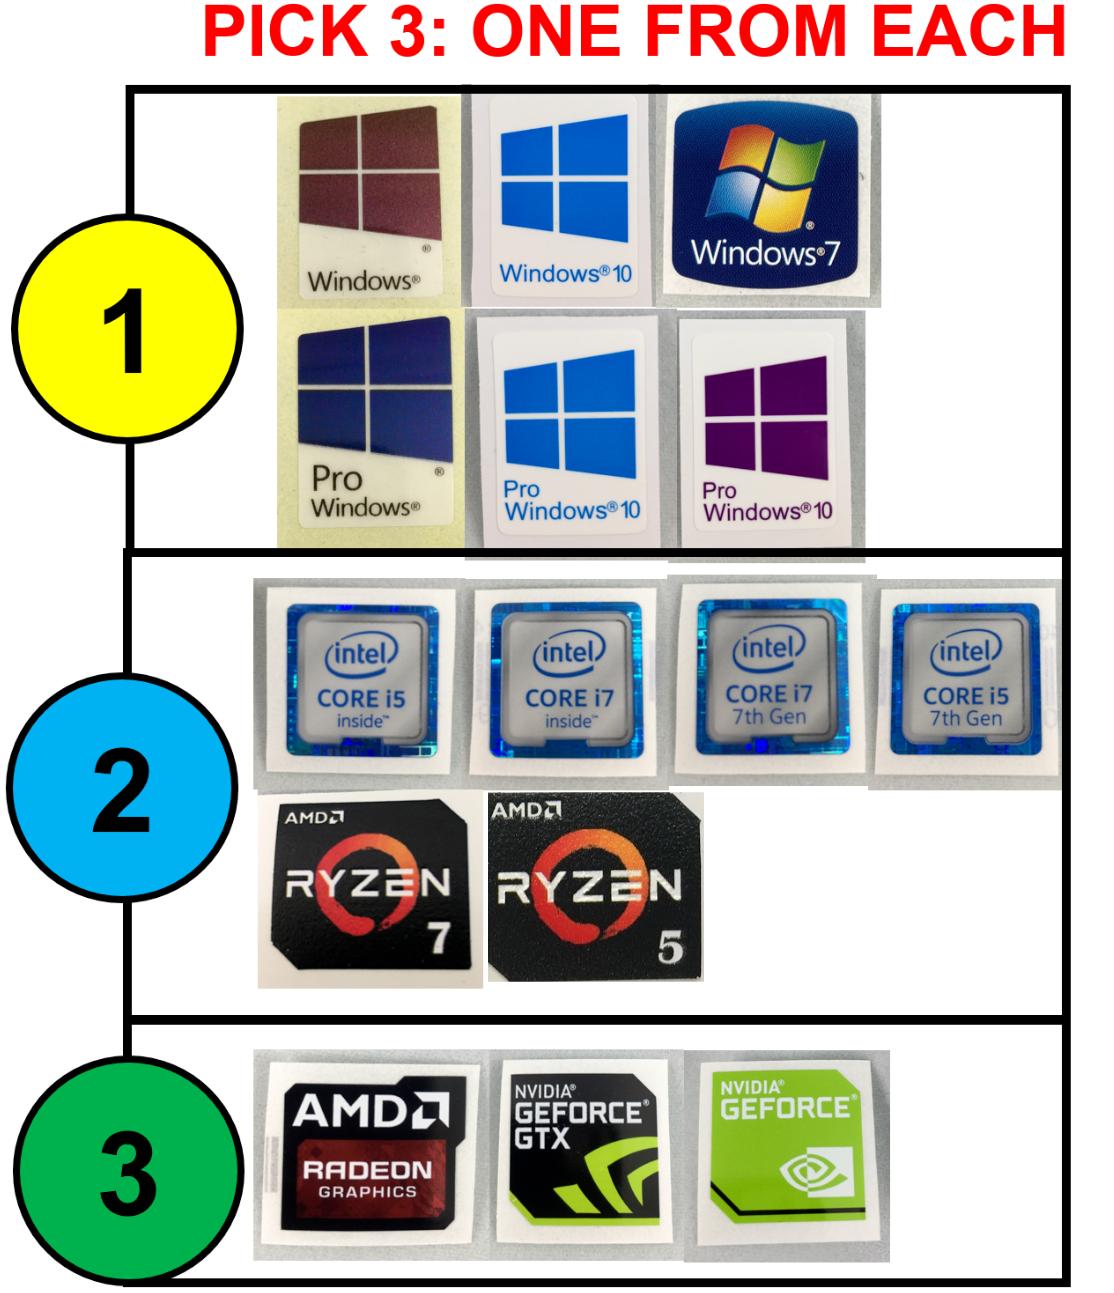 Intel Core I7 8th Gen Sticker Bahuma Logo I3 I5 Xeon Vpro Sandy Ivy Pc Laptop Blue Silver Black Source 3x Combo Windows 10 Pro 7th Amd Ryzen Nvidia